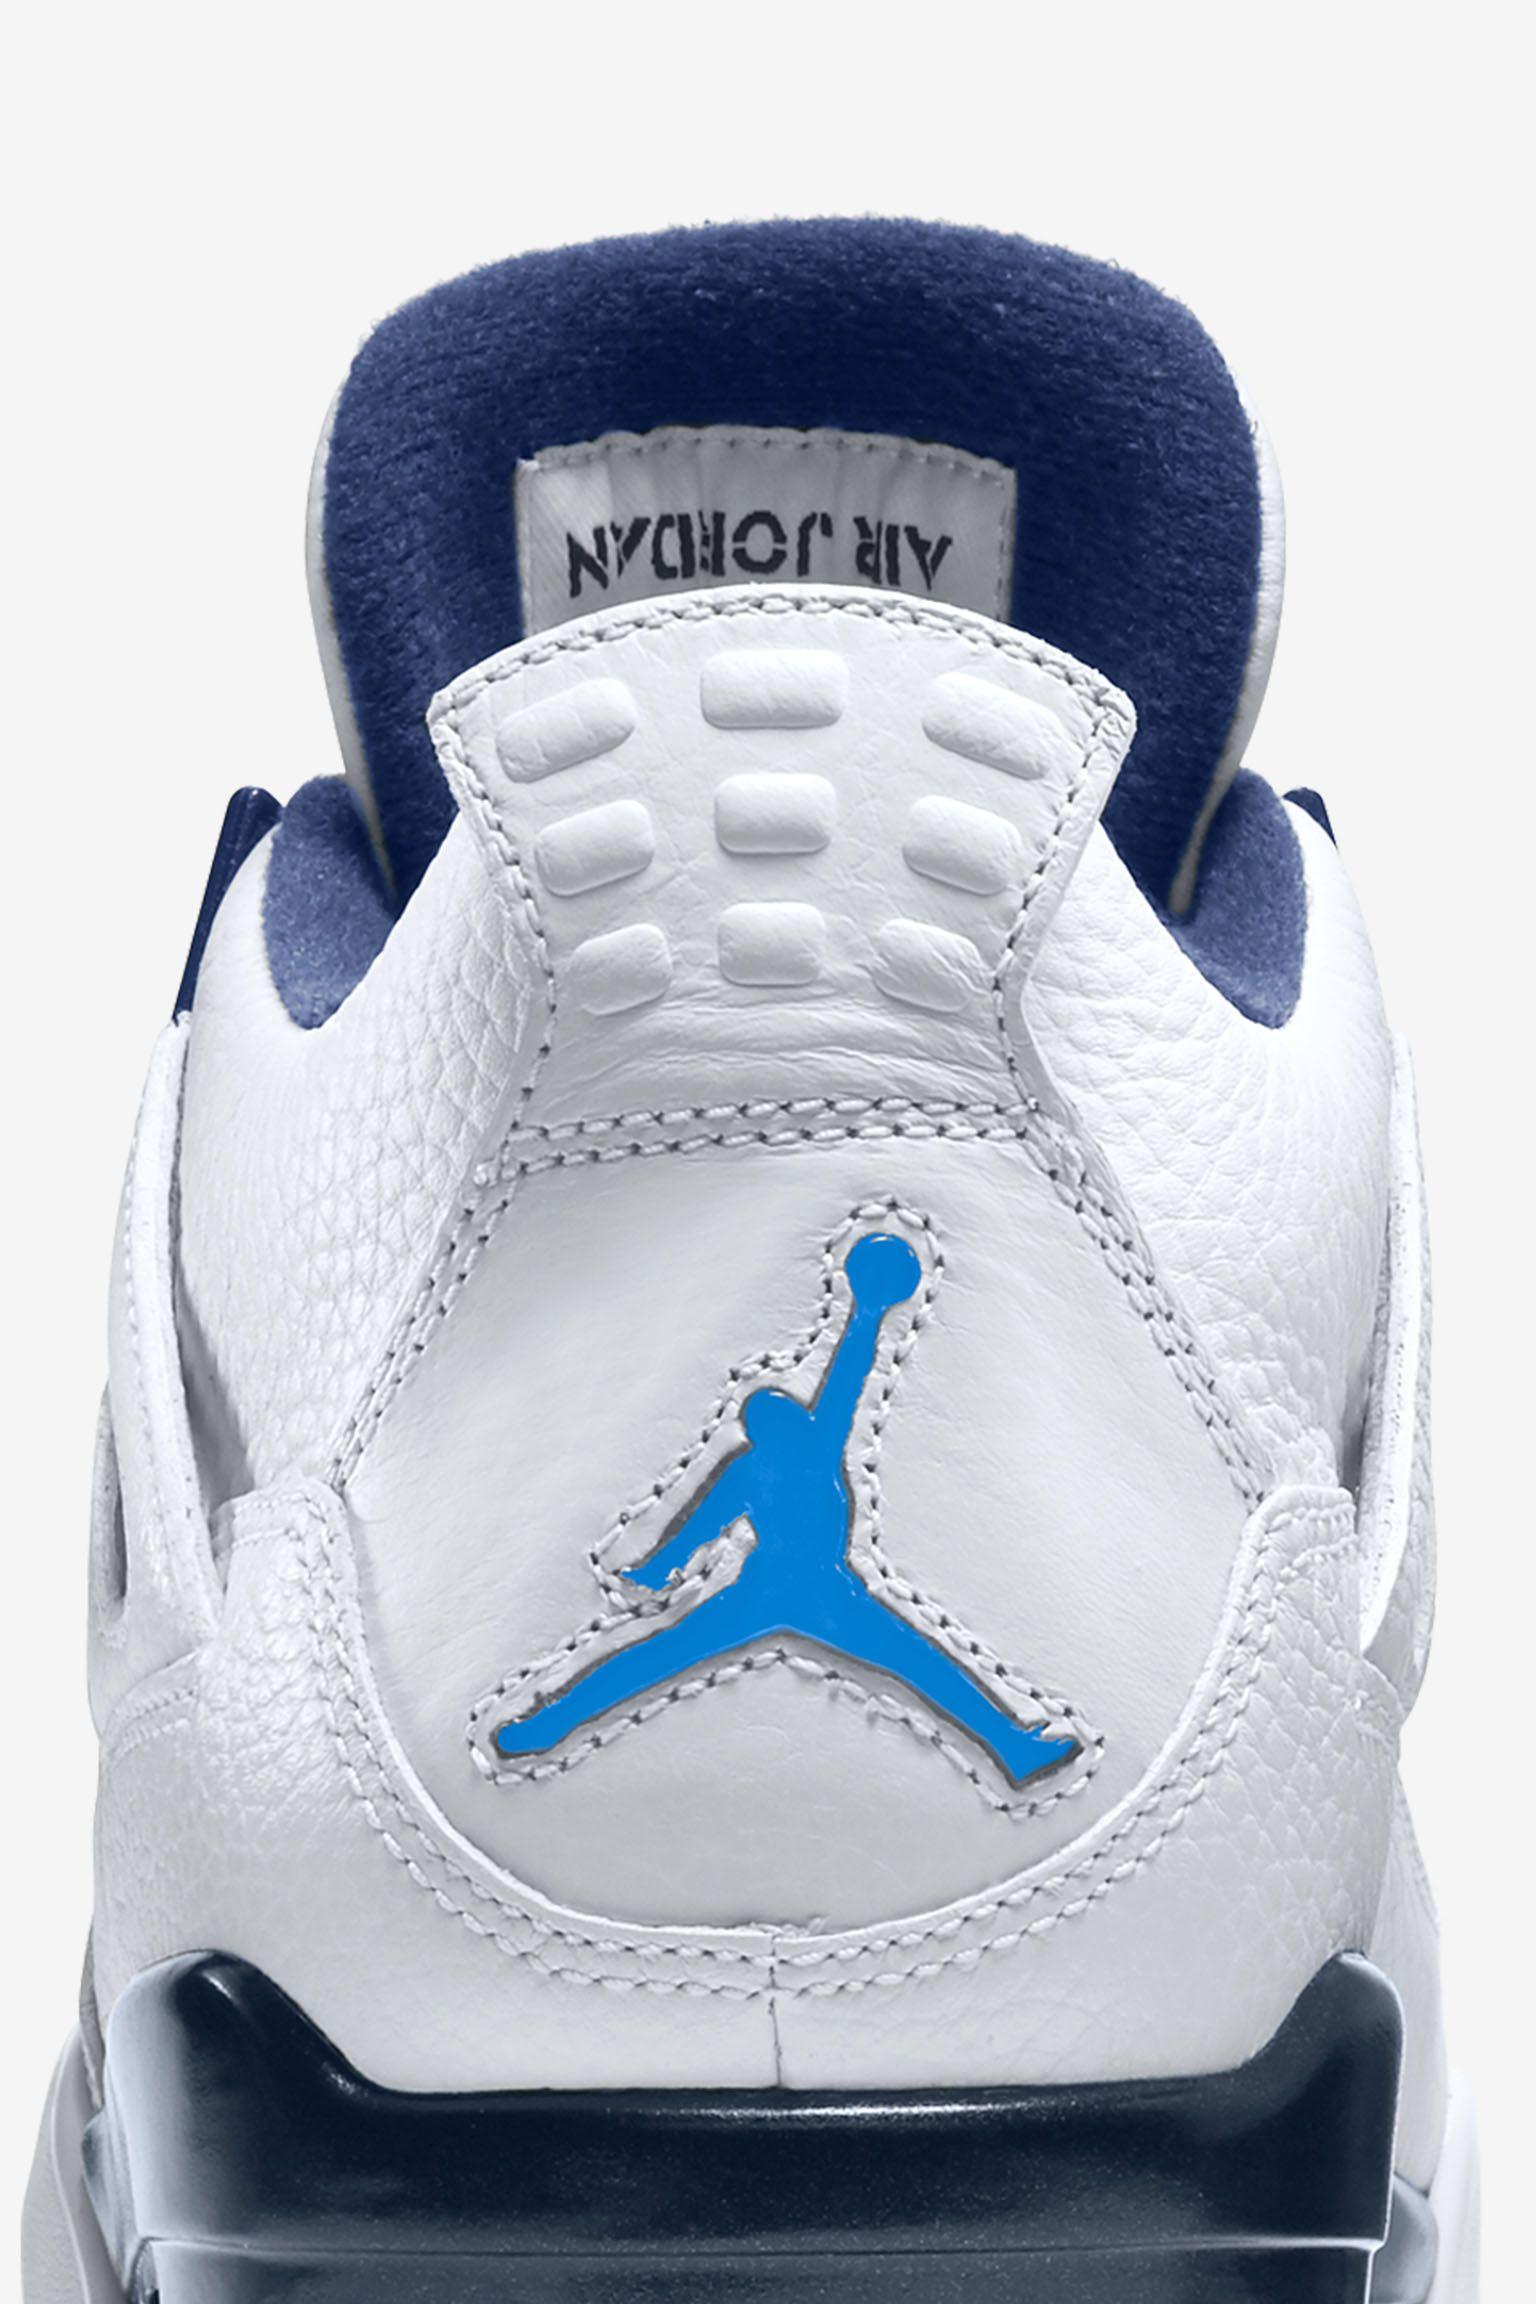 Air Jordan 4 Retro 'Legend Blue' Release Date